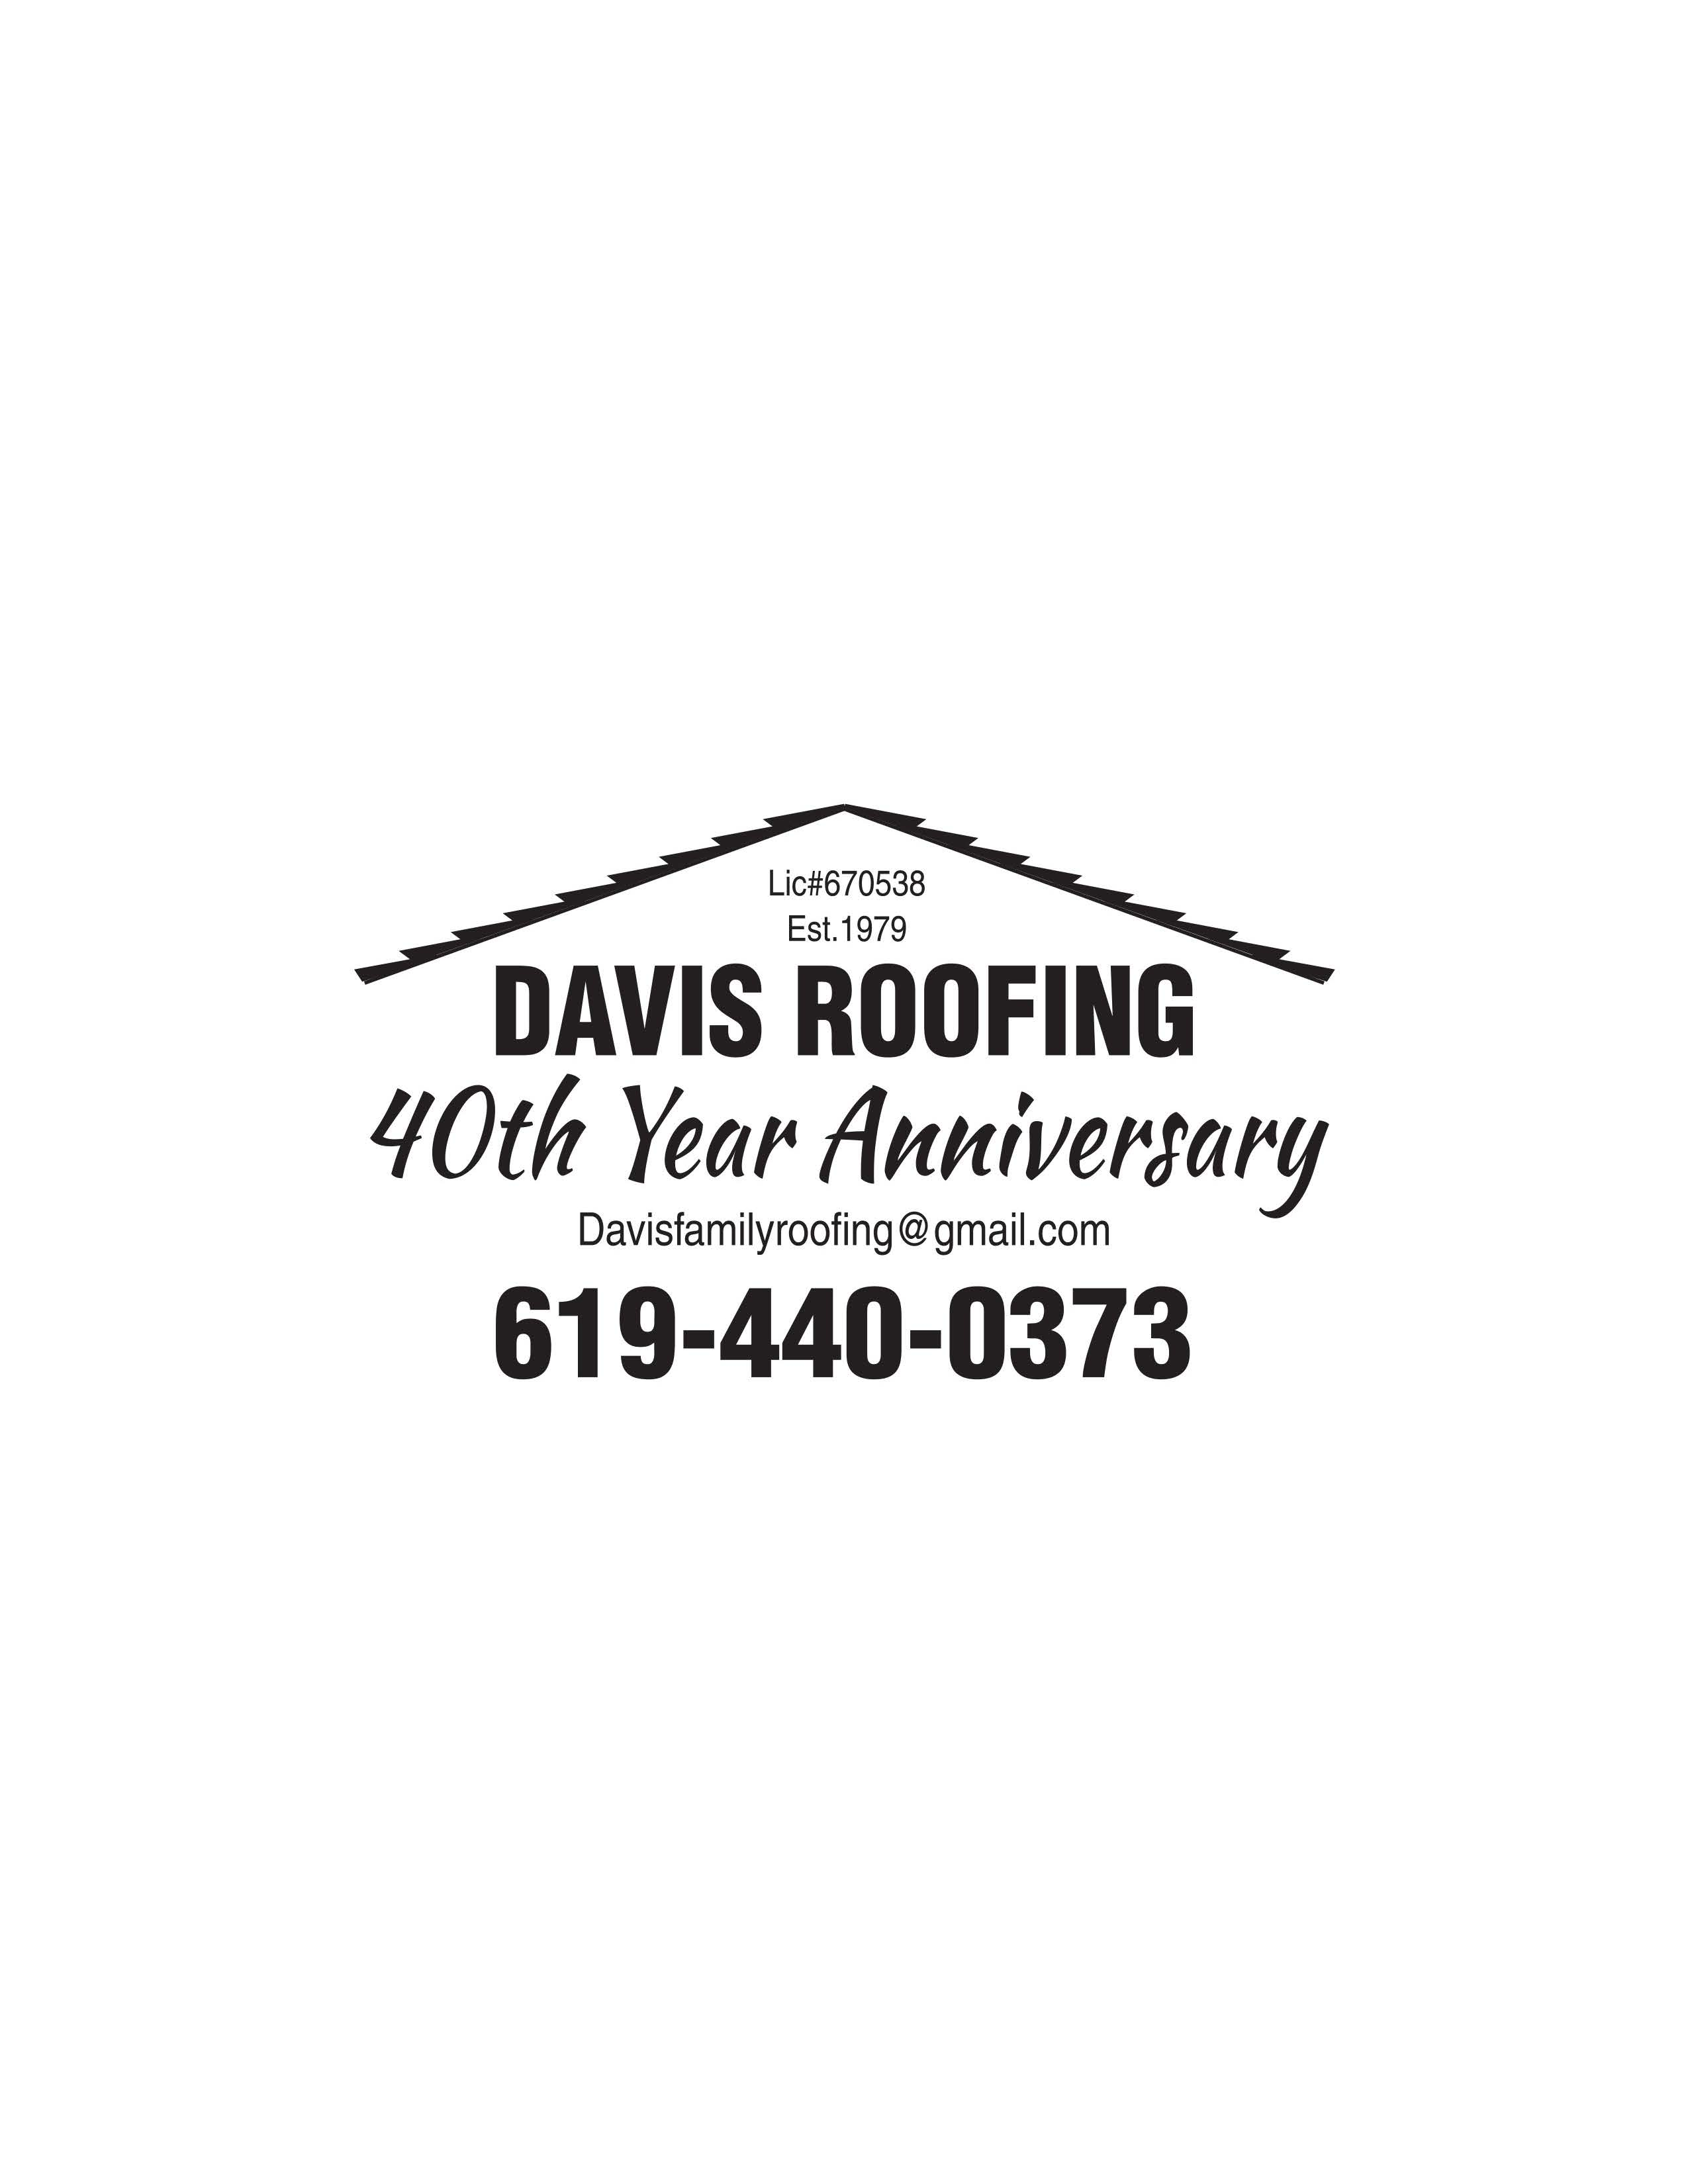 Davis Roofing